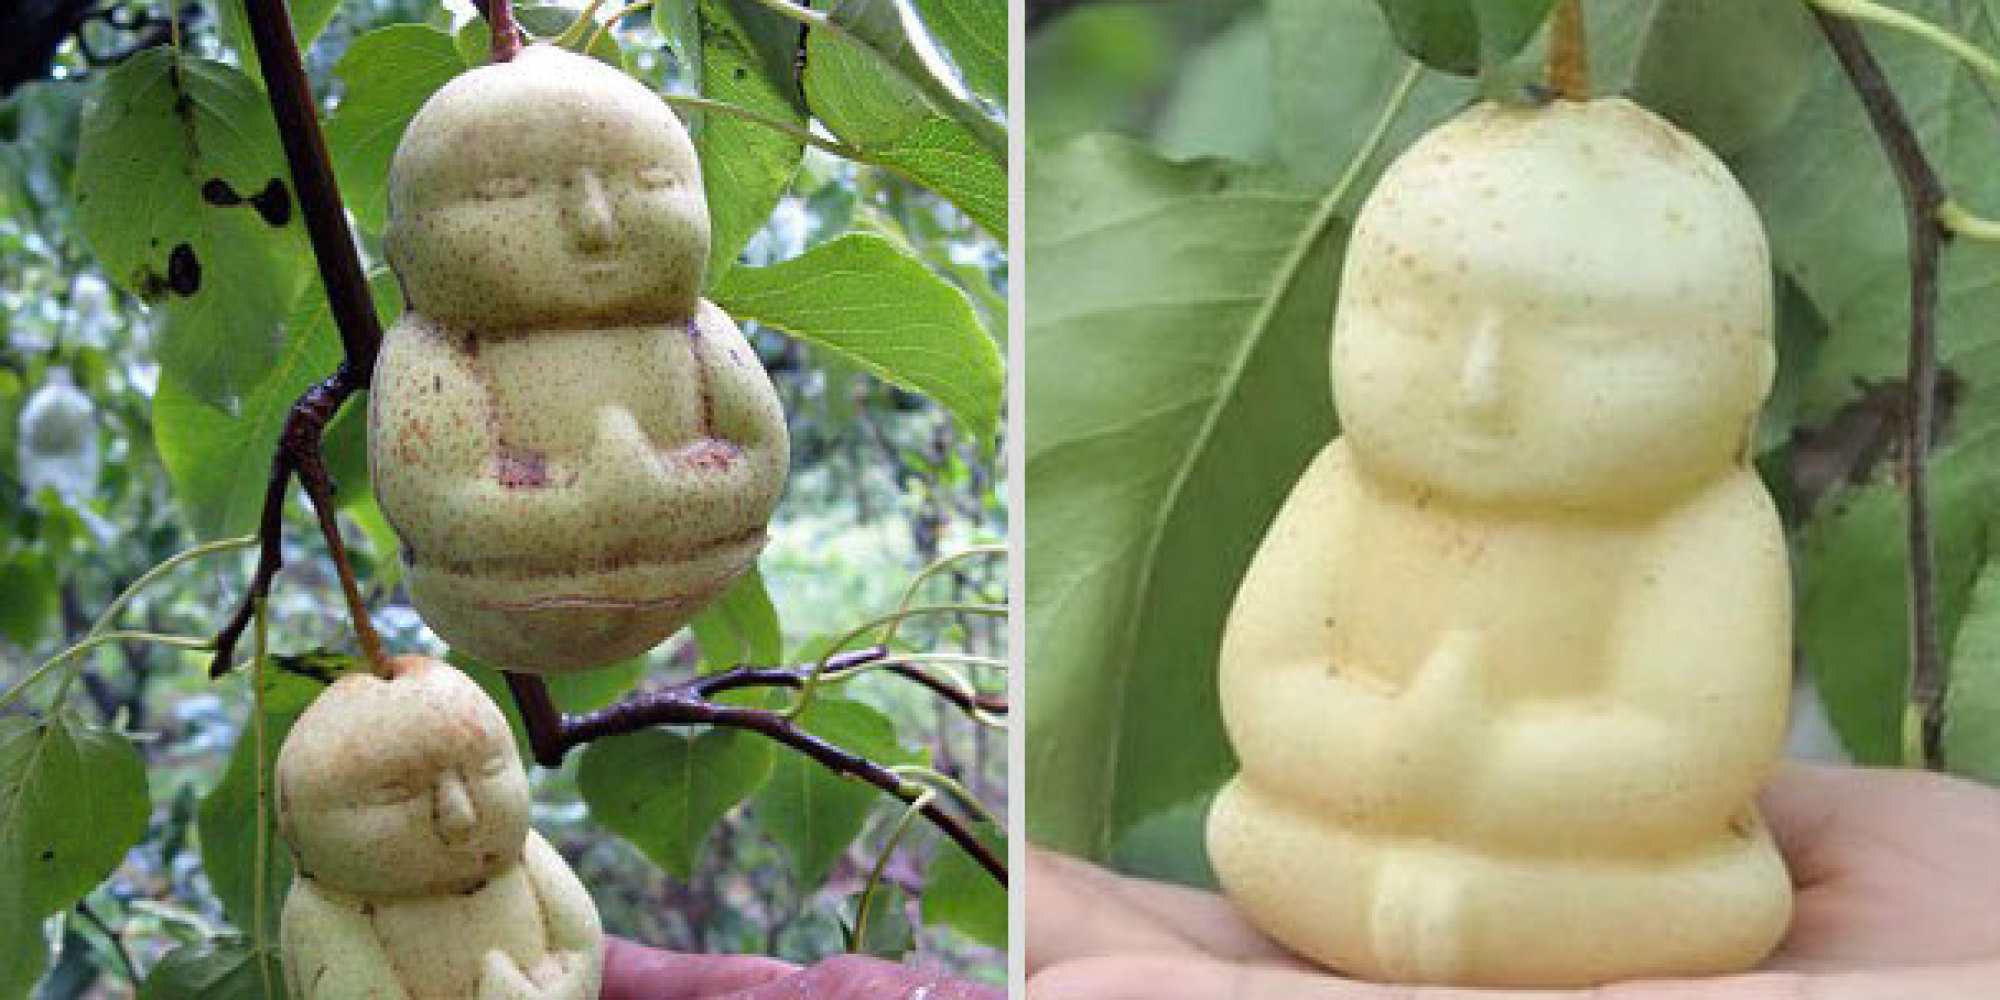 Fruit-Growing Genius Shapes Pears Into Tiny Buddhas